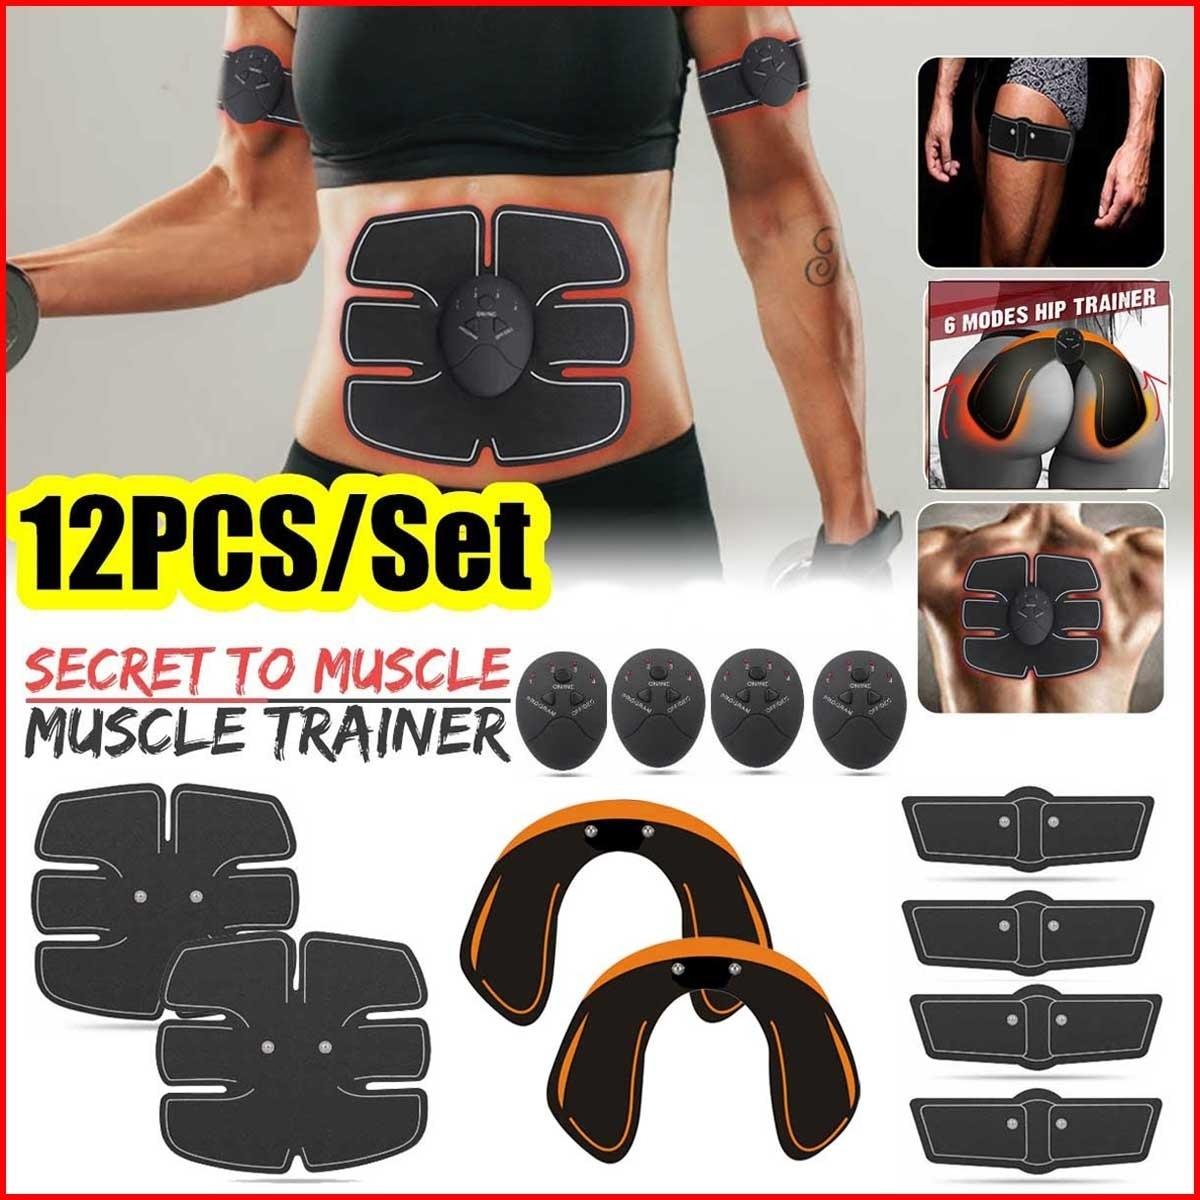 12pcs/Set 10 Grade 6 Mode Unisex EMS Hips Trainer and Butt Toner,EMS Muscle Stimulator Abdomen Fat Burning Training Gear